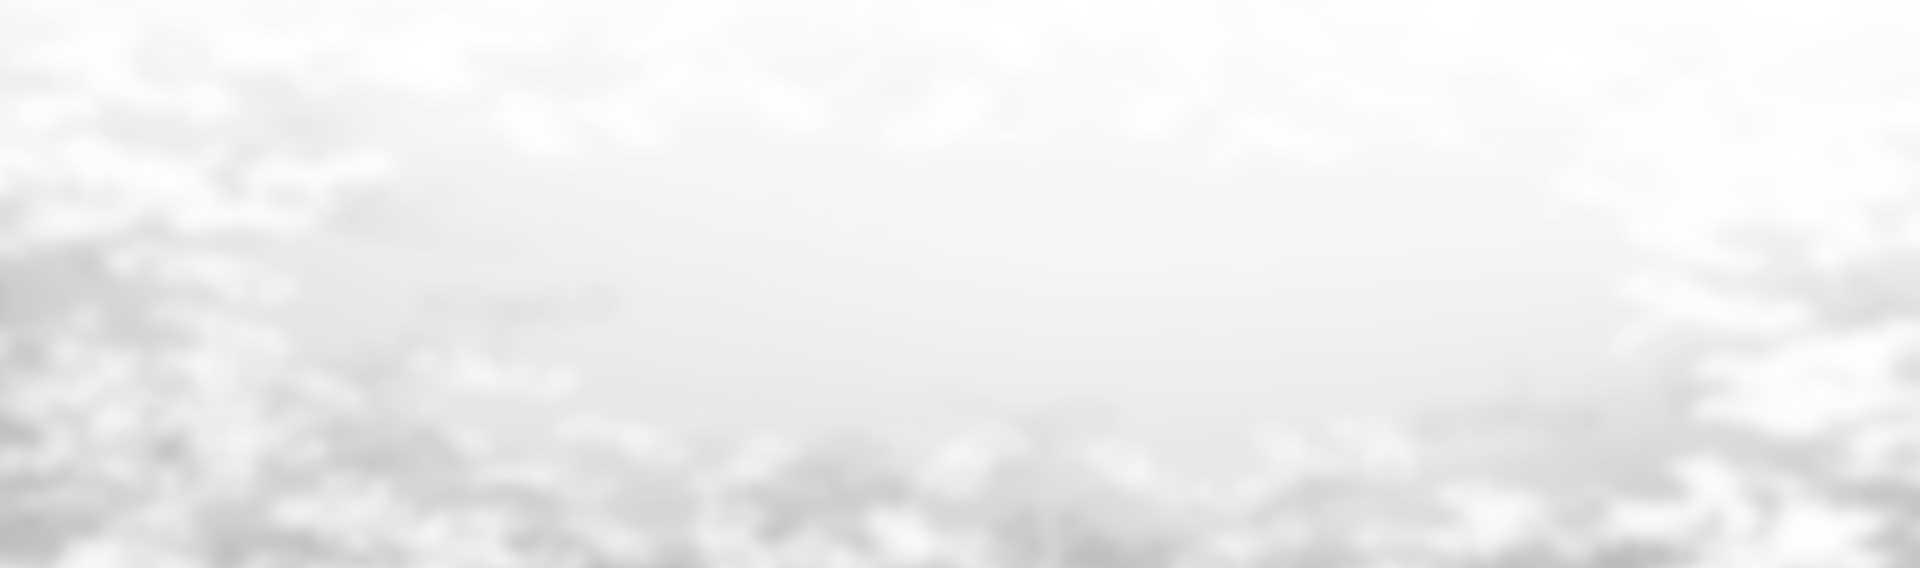 revslider_bg_summer_soft_grey2